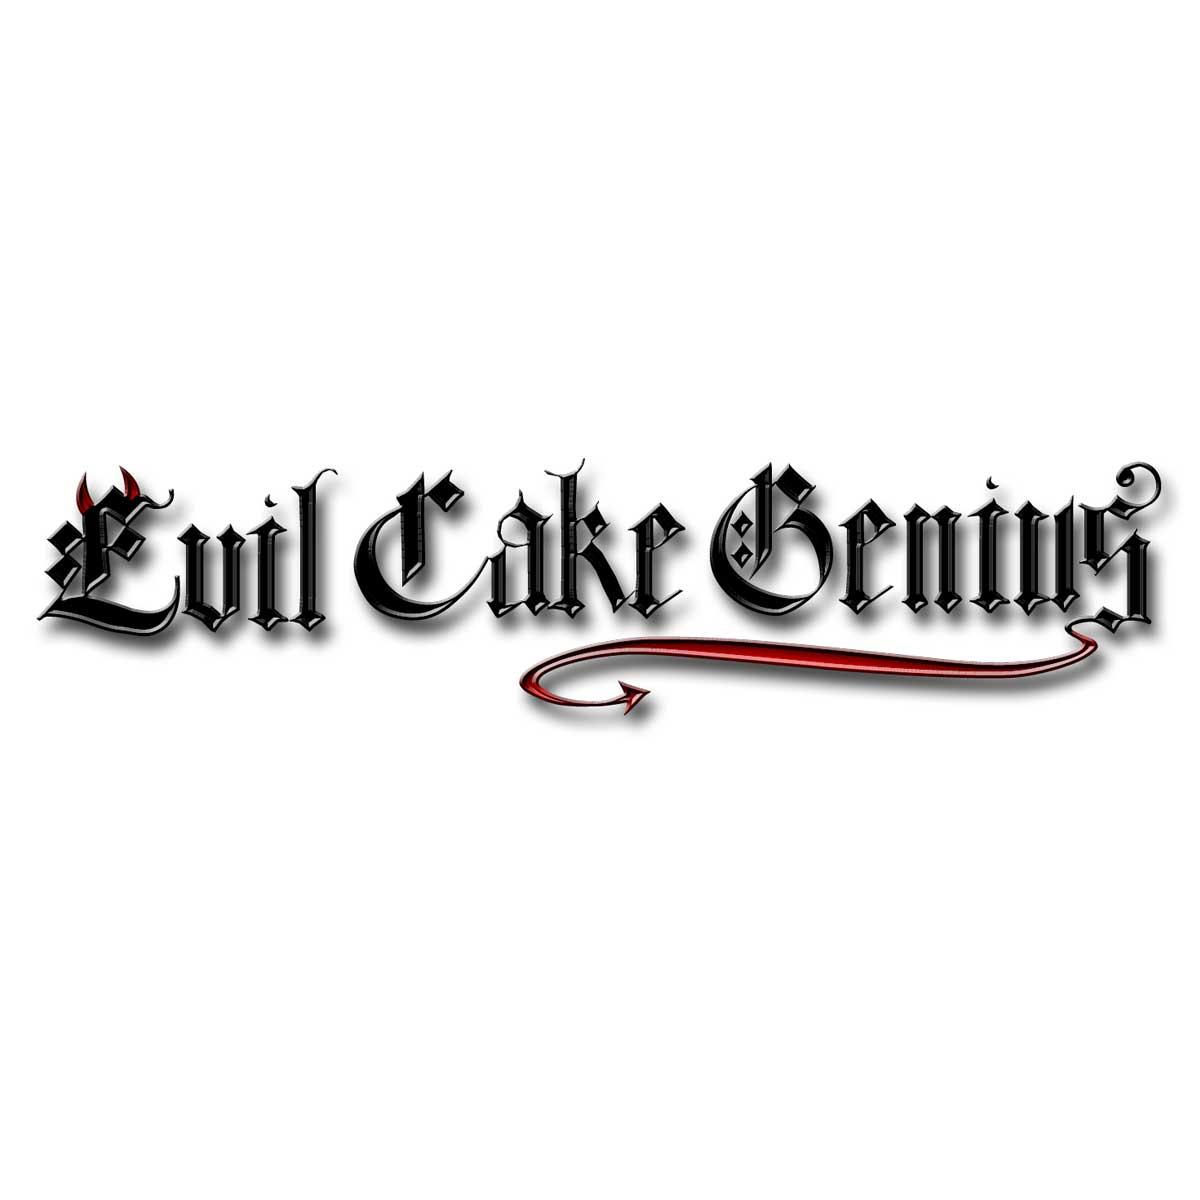 Seamless Velvet Burnout Stencil Evil Cake Genius